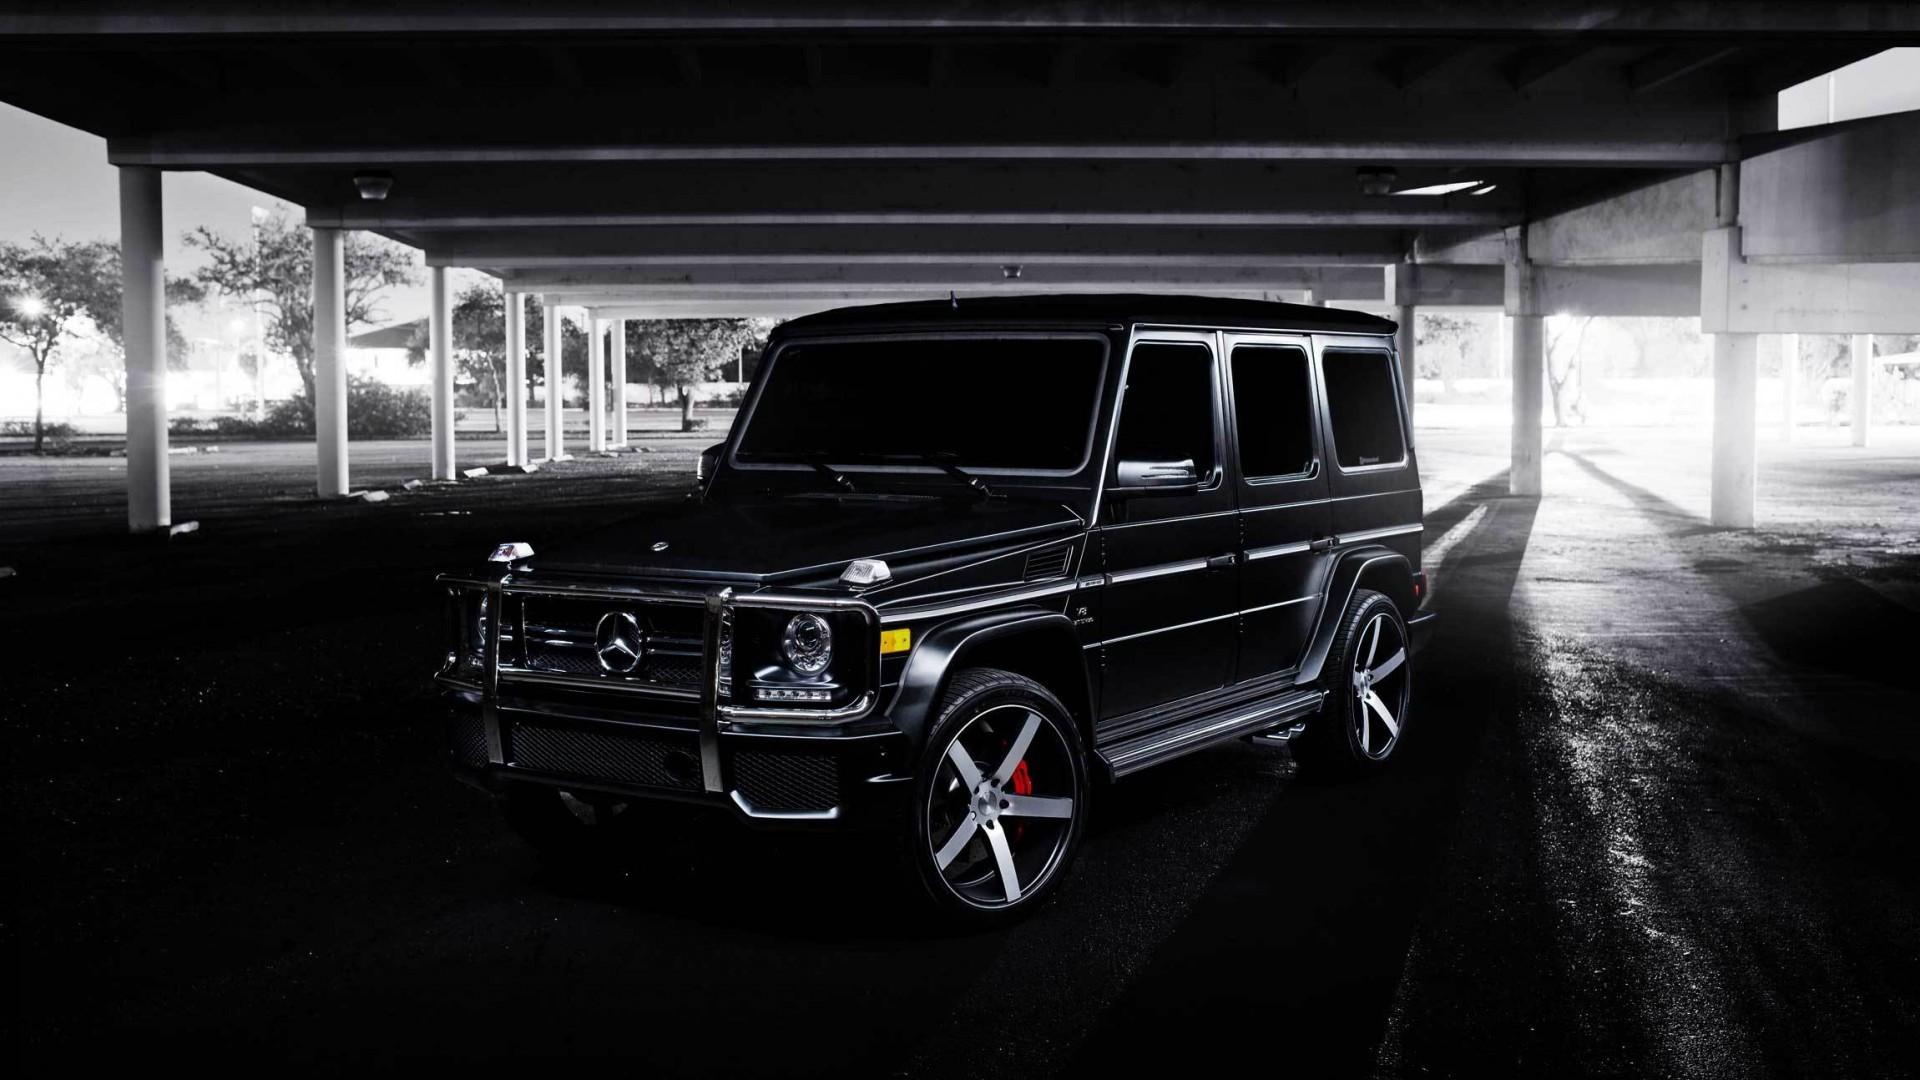 Wallpaper car mercedes benz gelandewagen mercedes for Mercedes benz gelandewagen